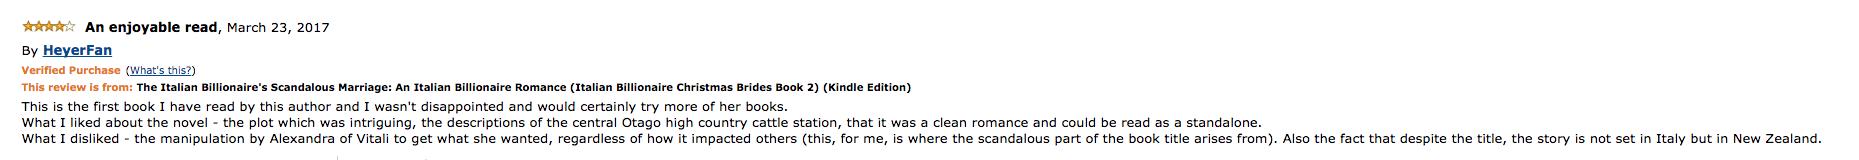 Scandalous amazon review Lesley